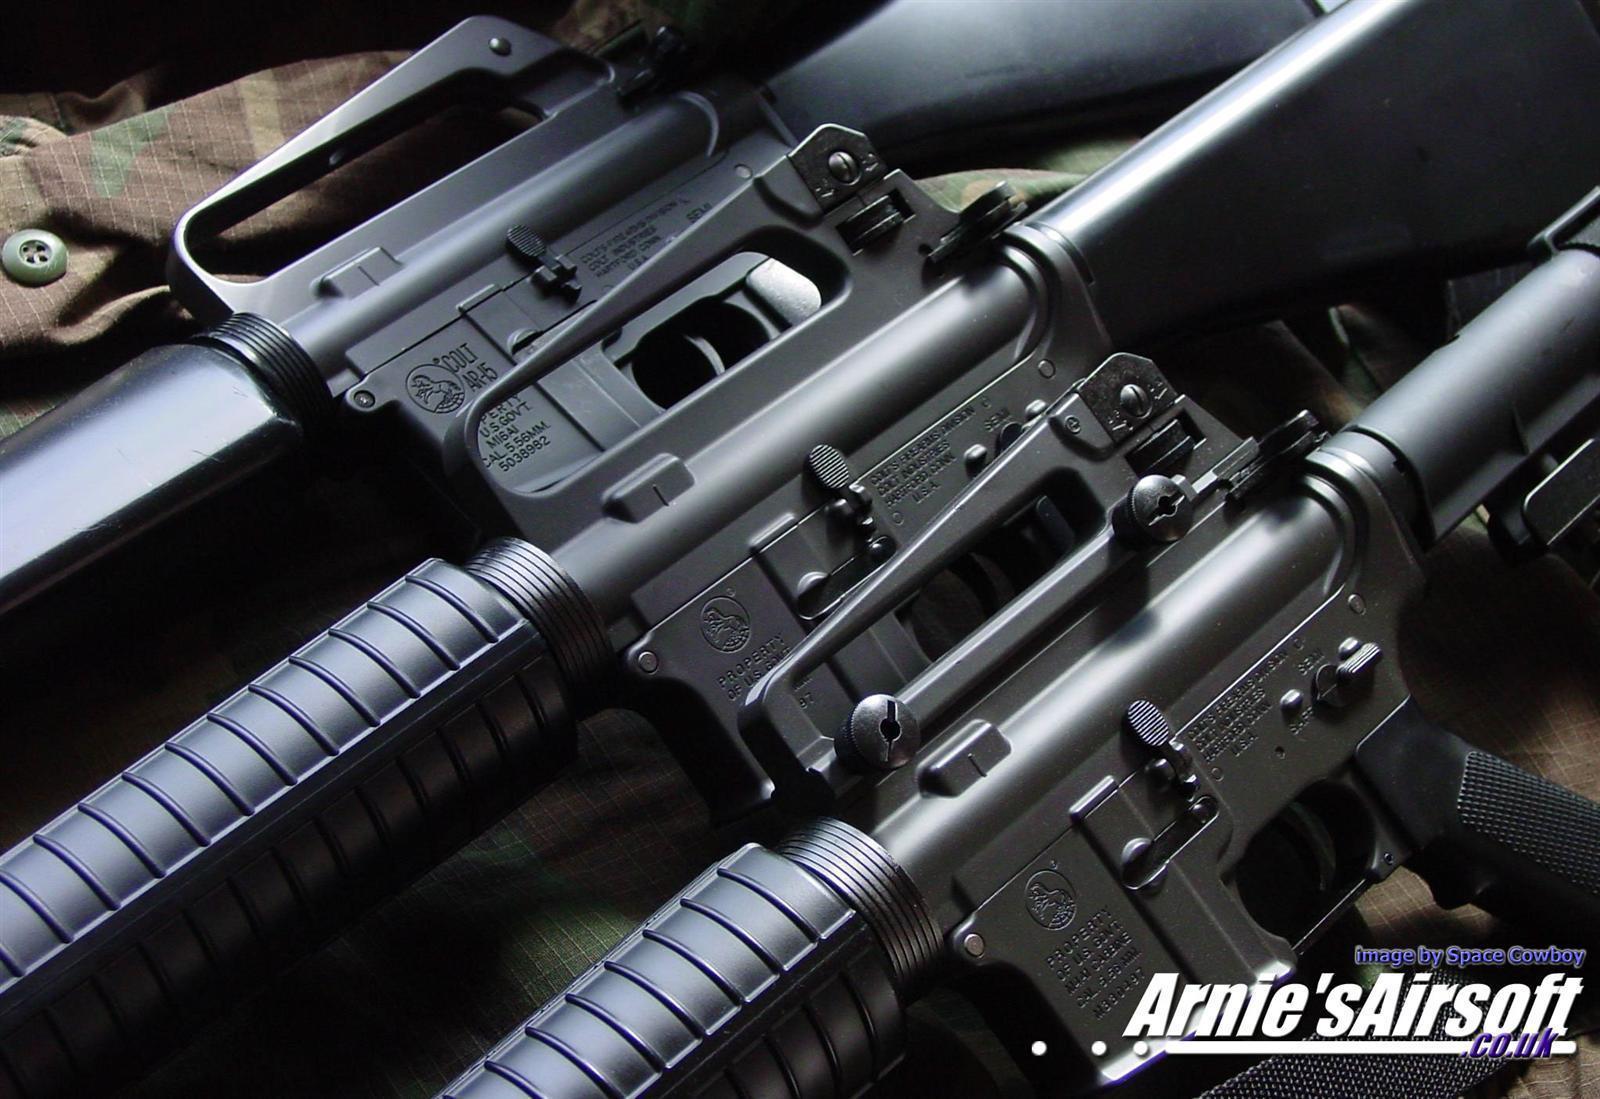 m16 gun wallpaper desktop - photo #17